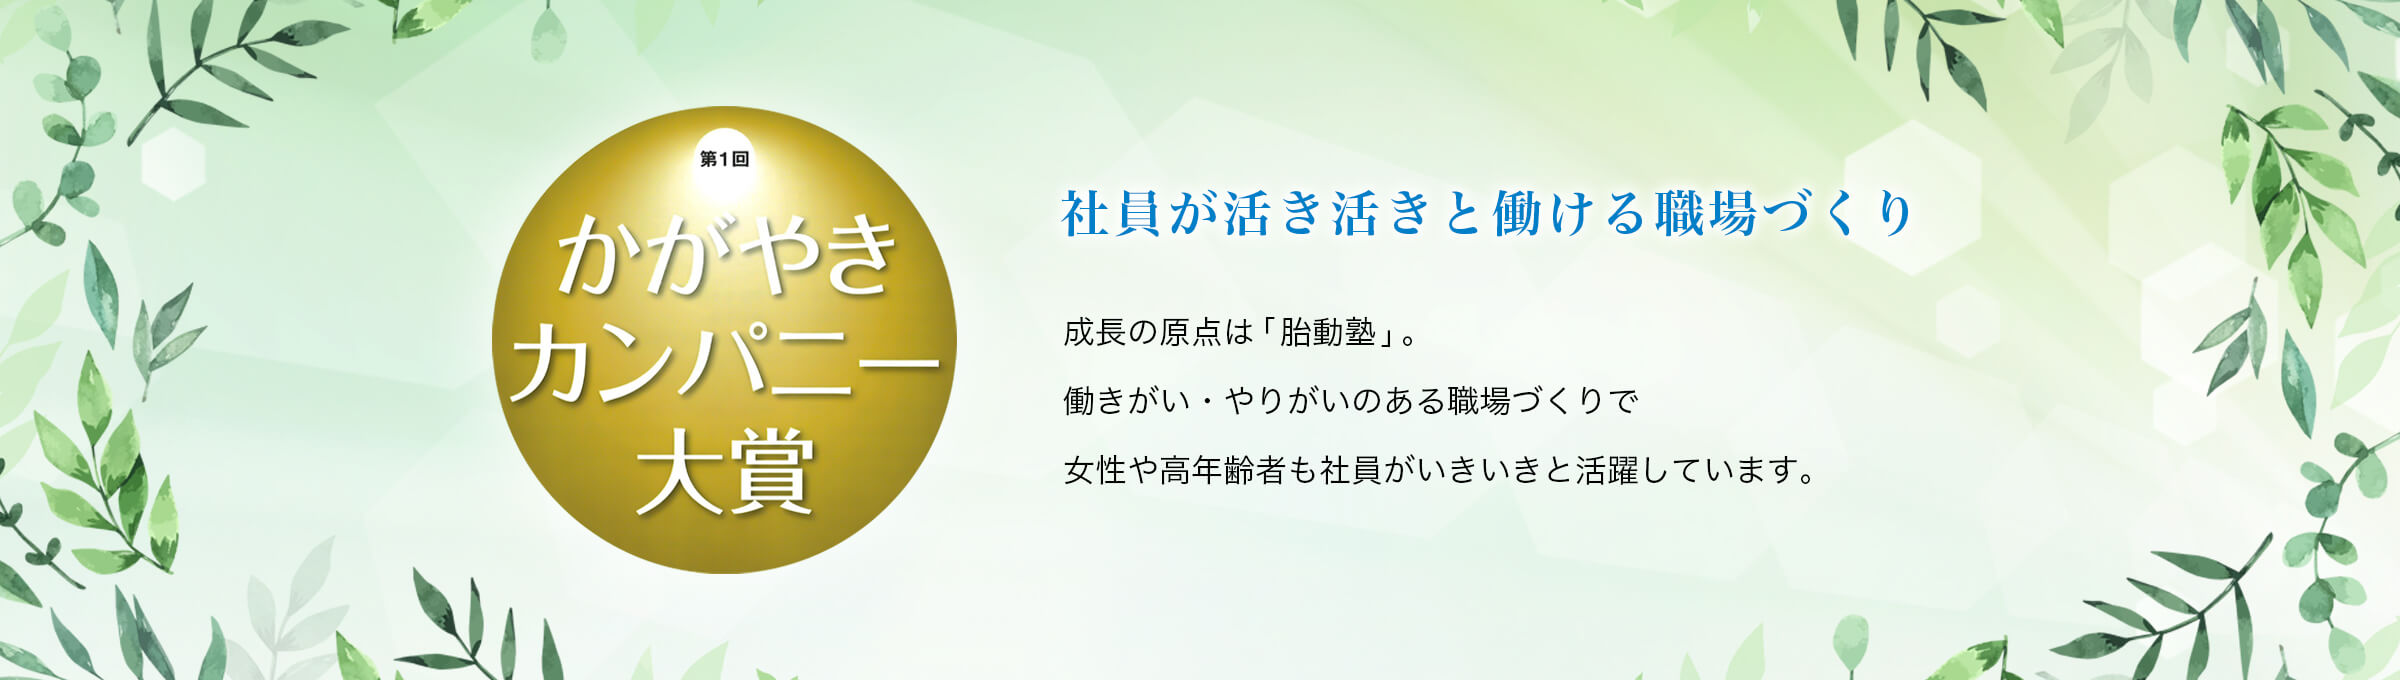 top-slide-kagayaki